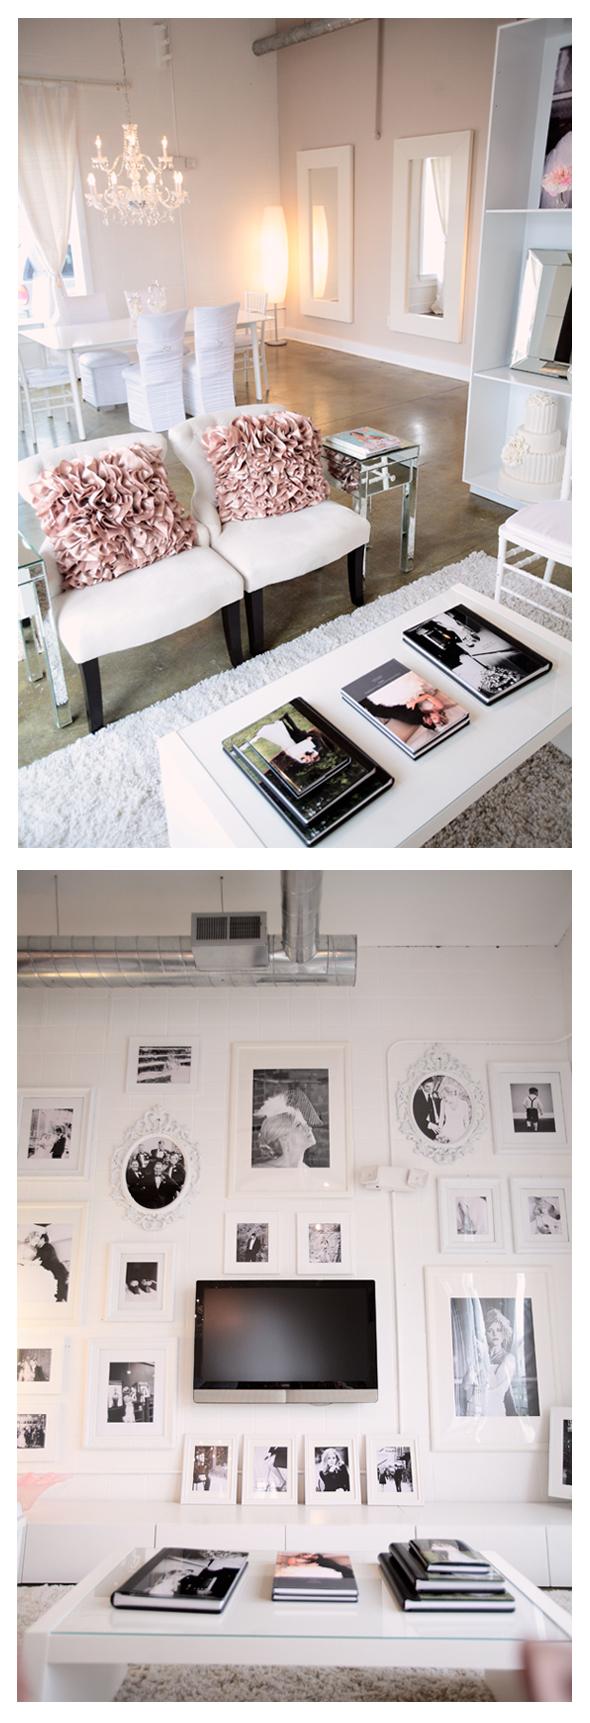 Wedding-Photography-Studio-Inspiration.jpg